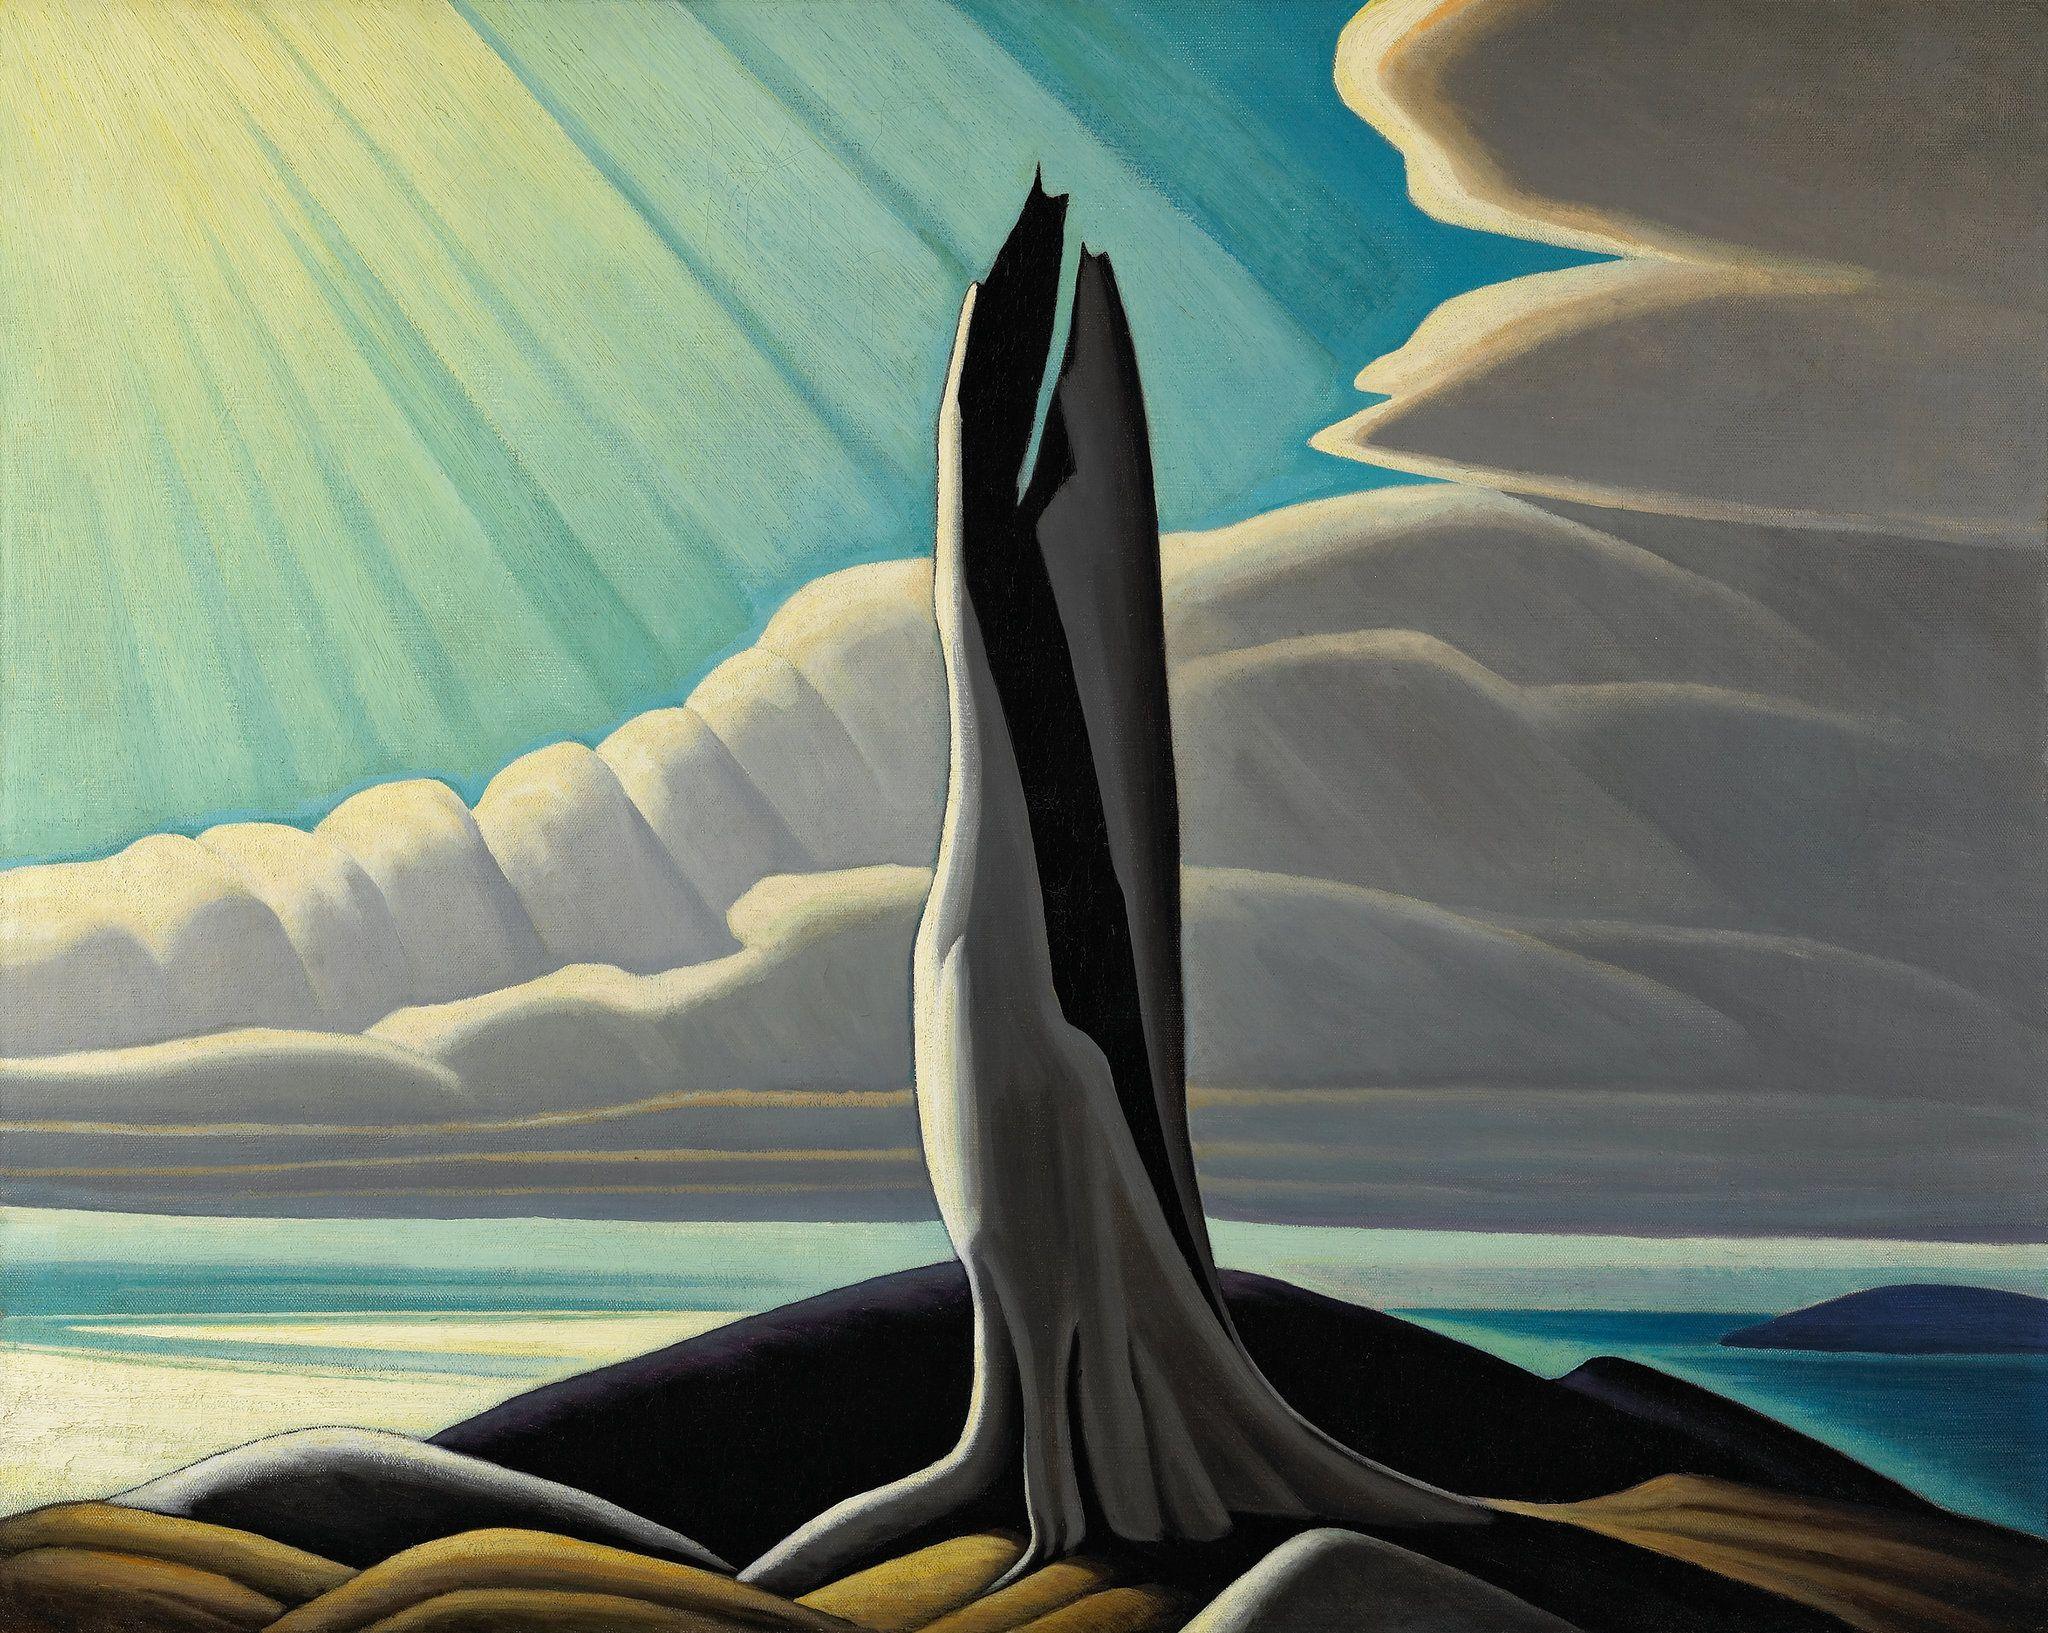 """North Shore, Lake Superior"" by Canadian artist Lawren Harris. Credit NGC/via Family of Lawren S. Harris"